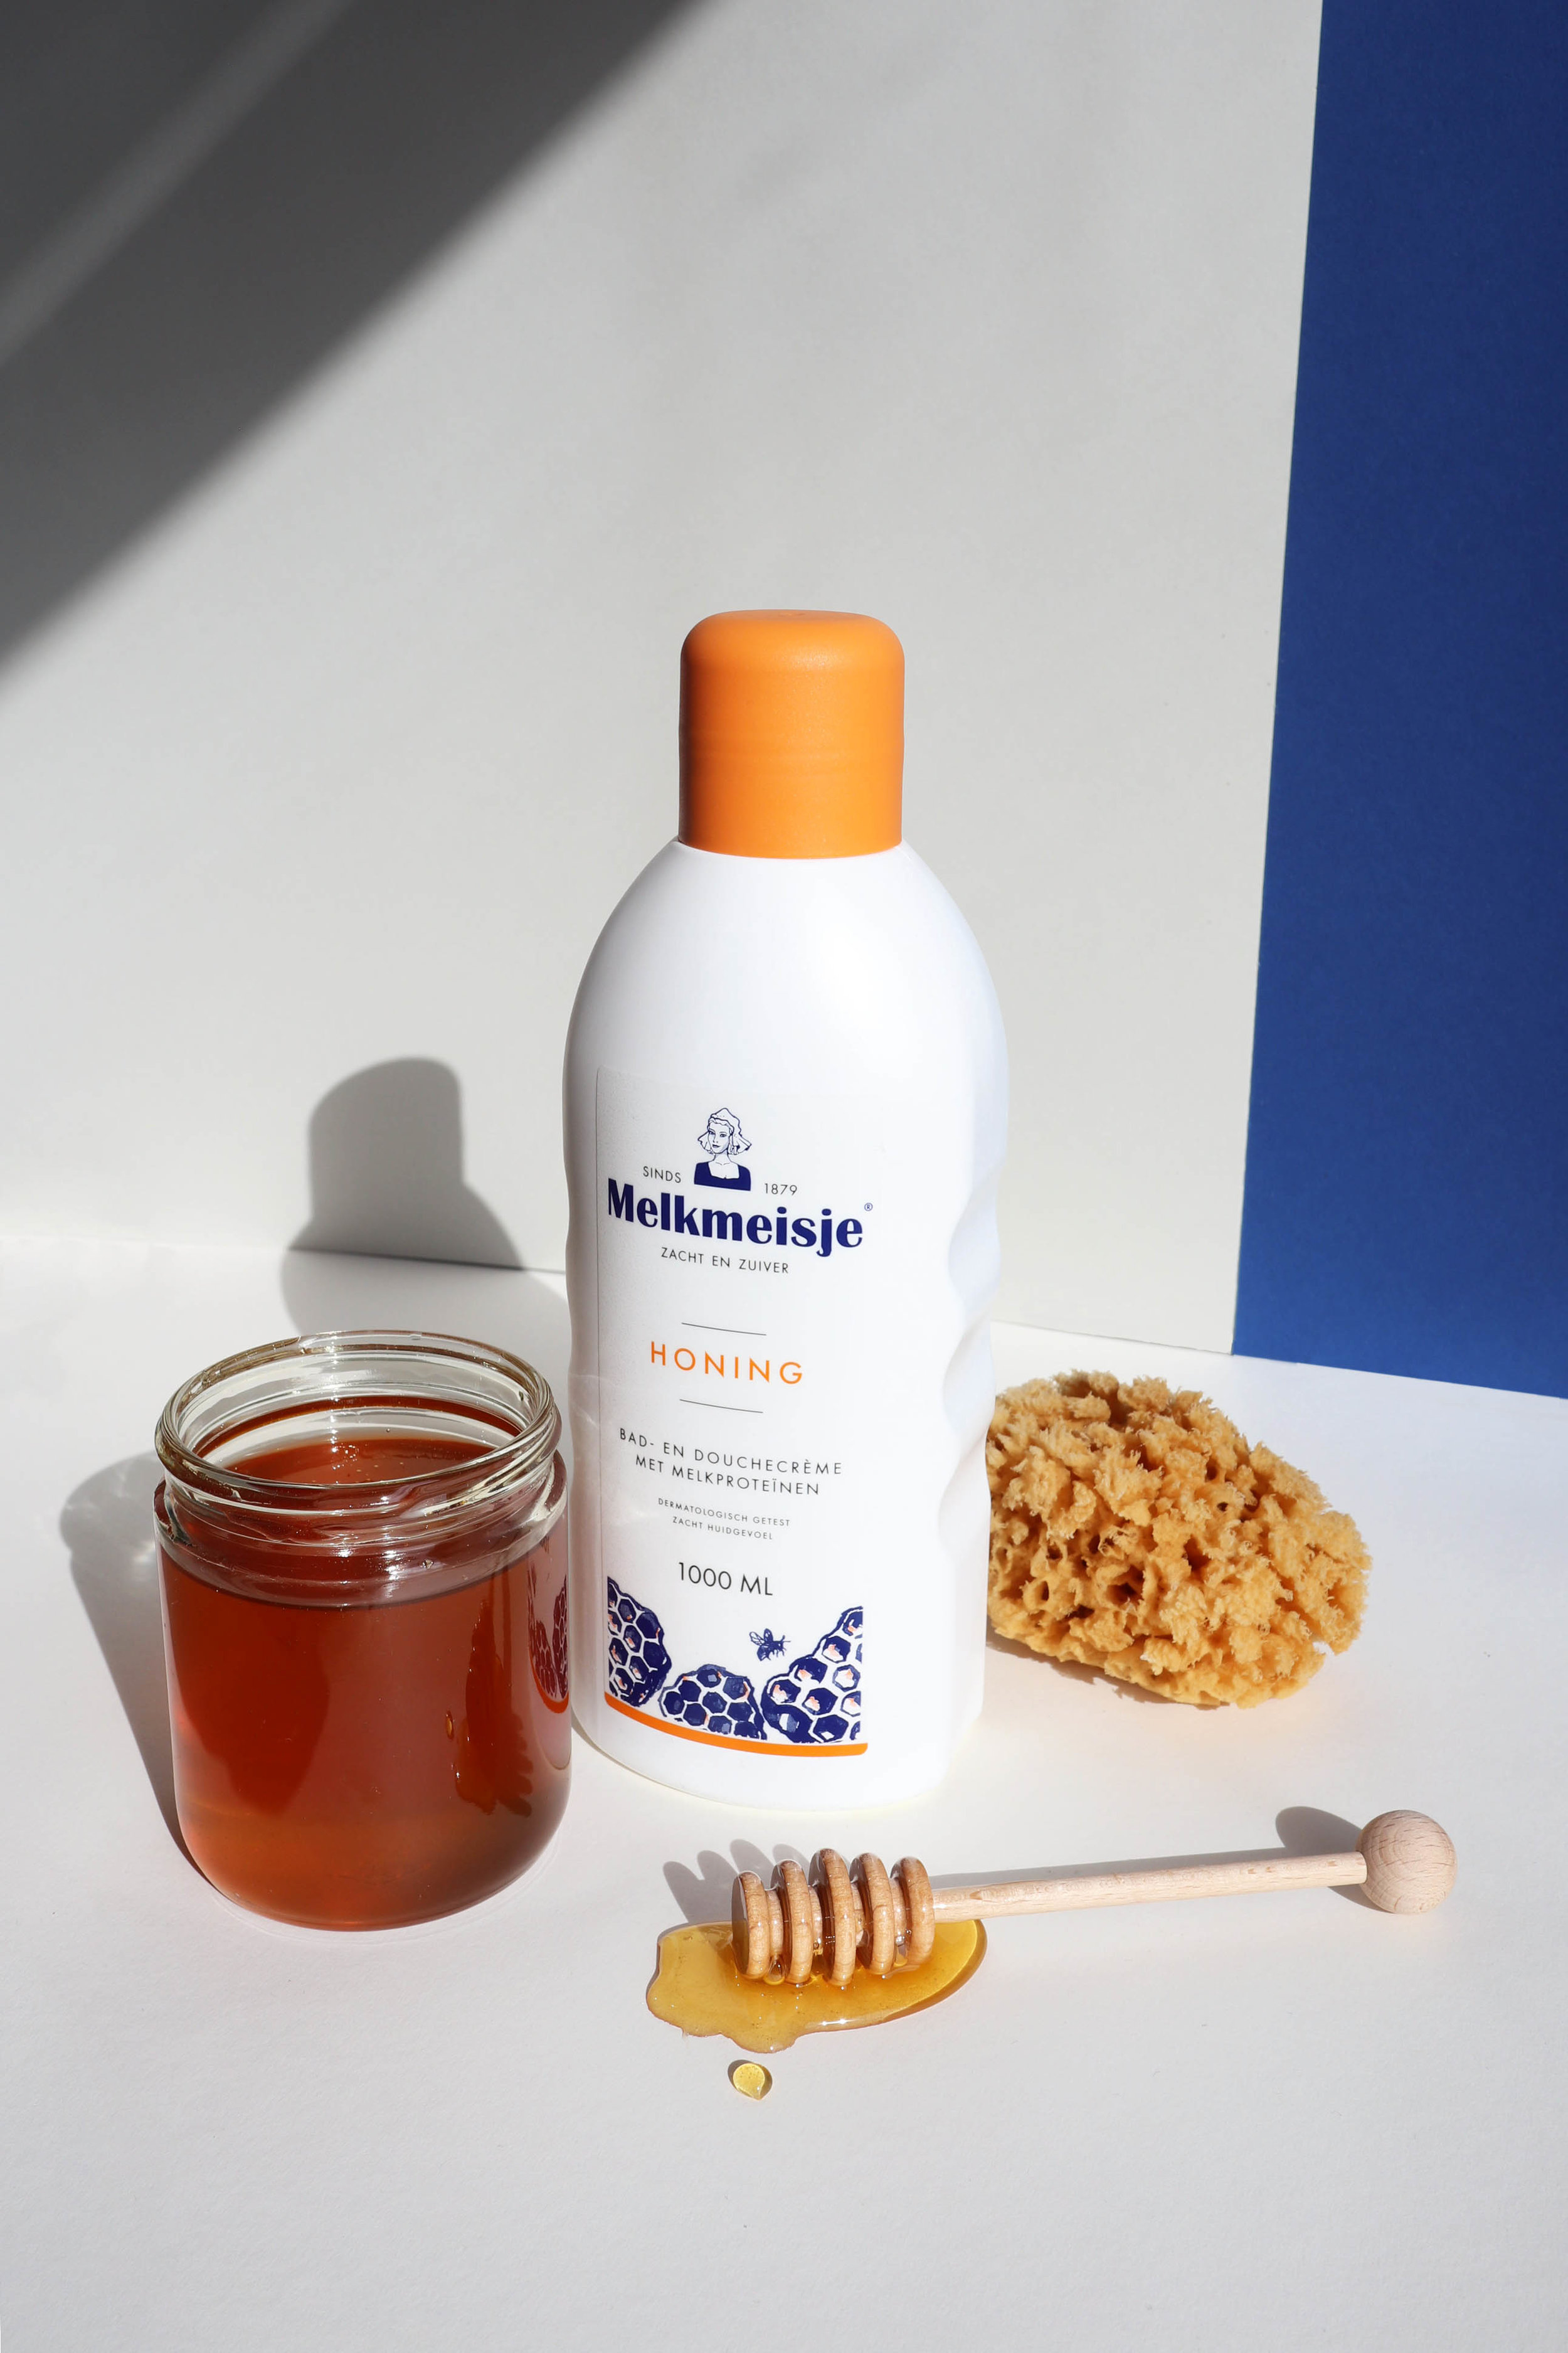 melkmeisje-honing-marketing-schmarketing-packaging-design.jpg